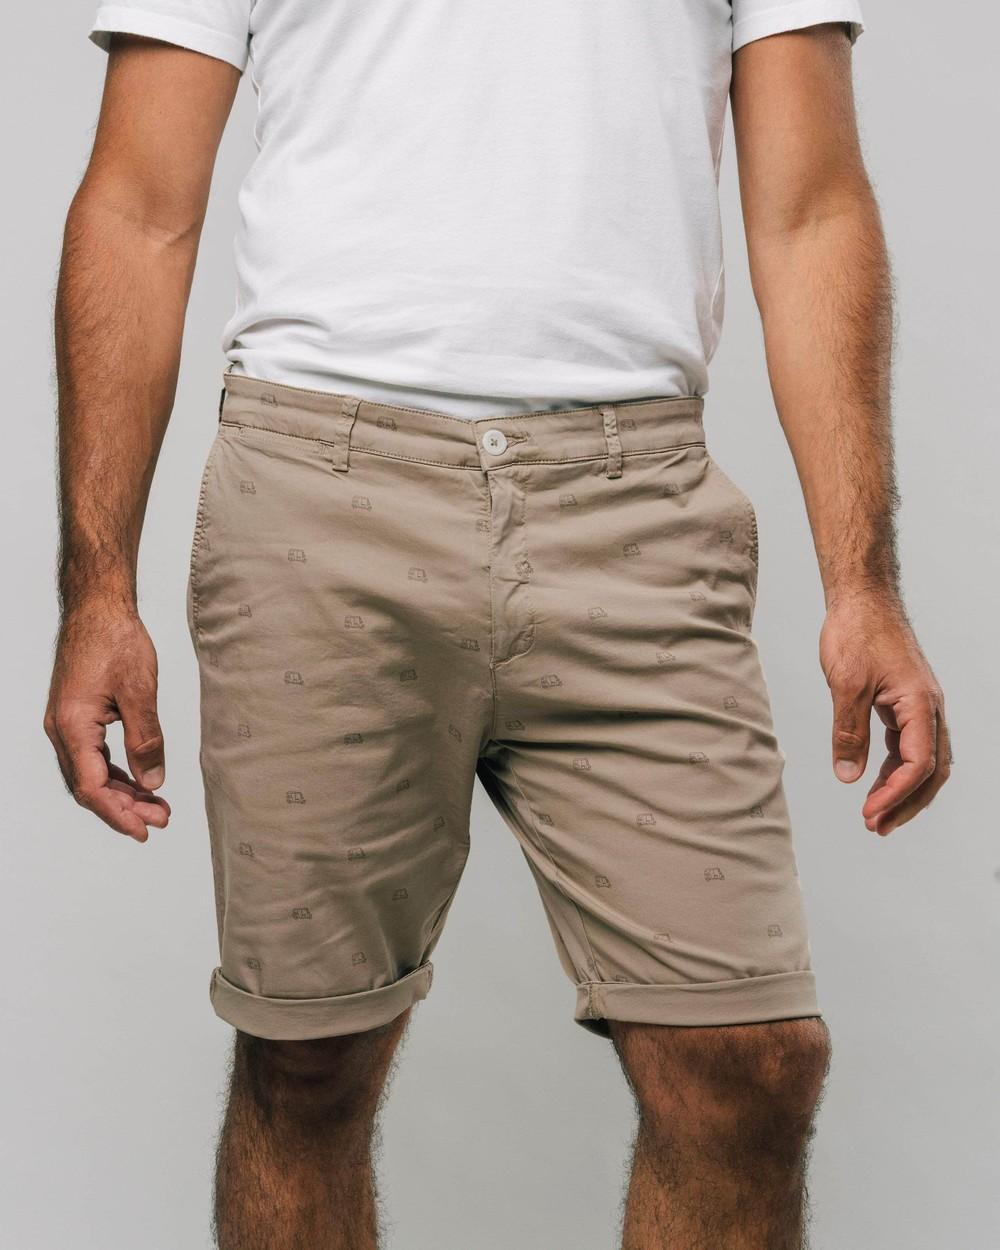 Tuk tuk race printed shorts - Brava Fabrics